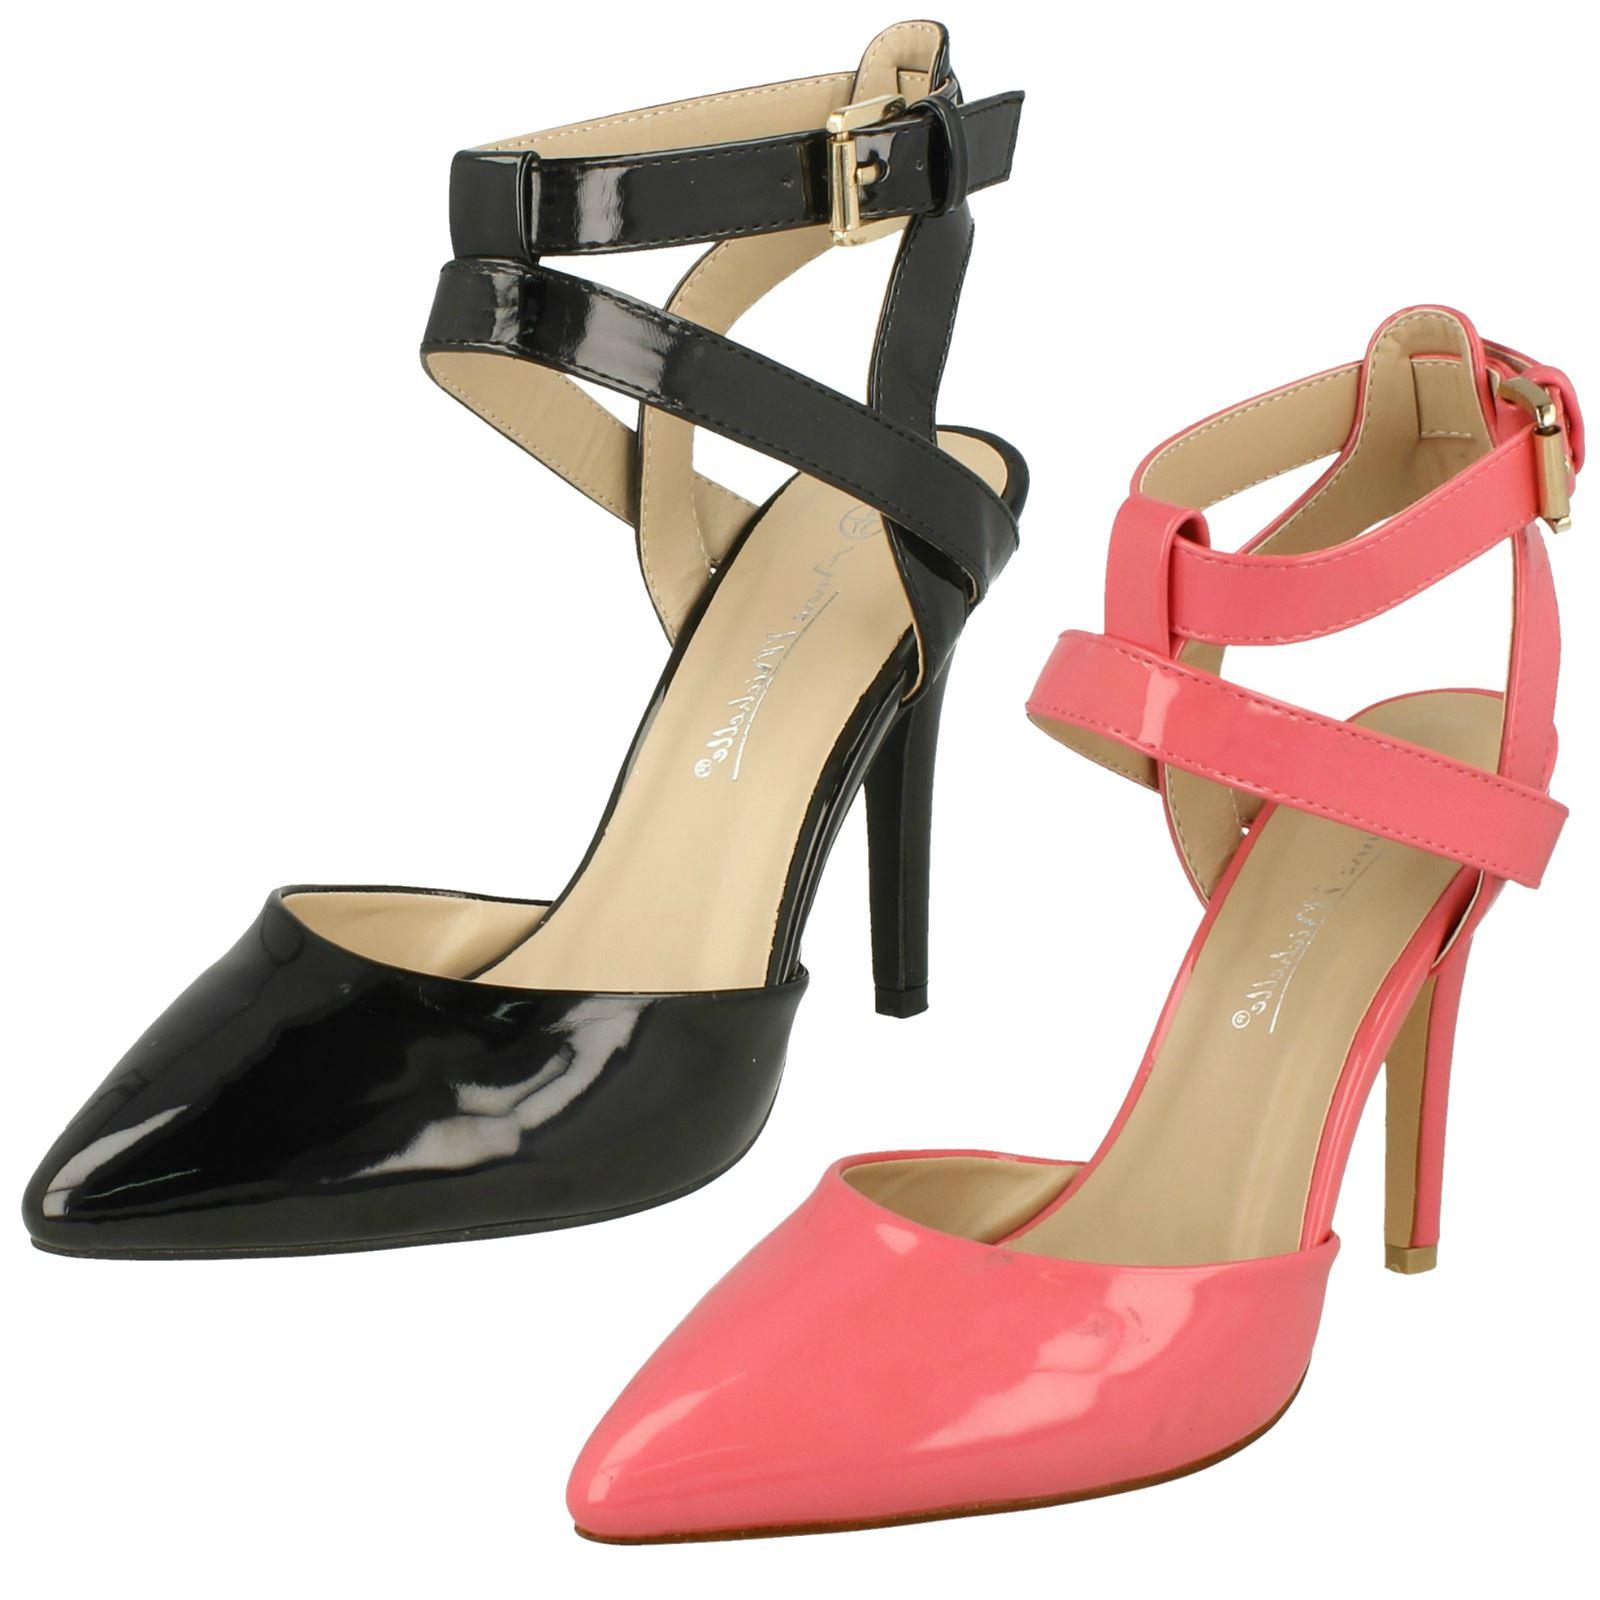 a1e565f34ba Details about Ladies Anne Michelle High Heel Ankle Strap Court Shoe